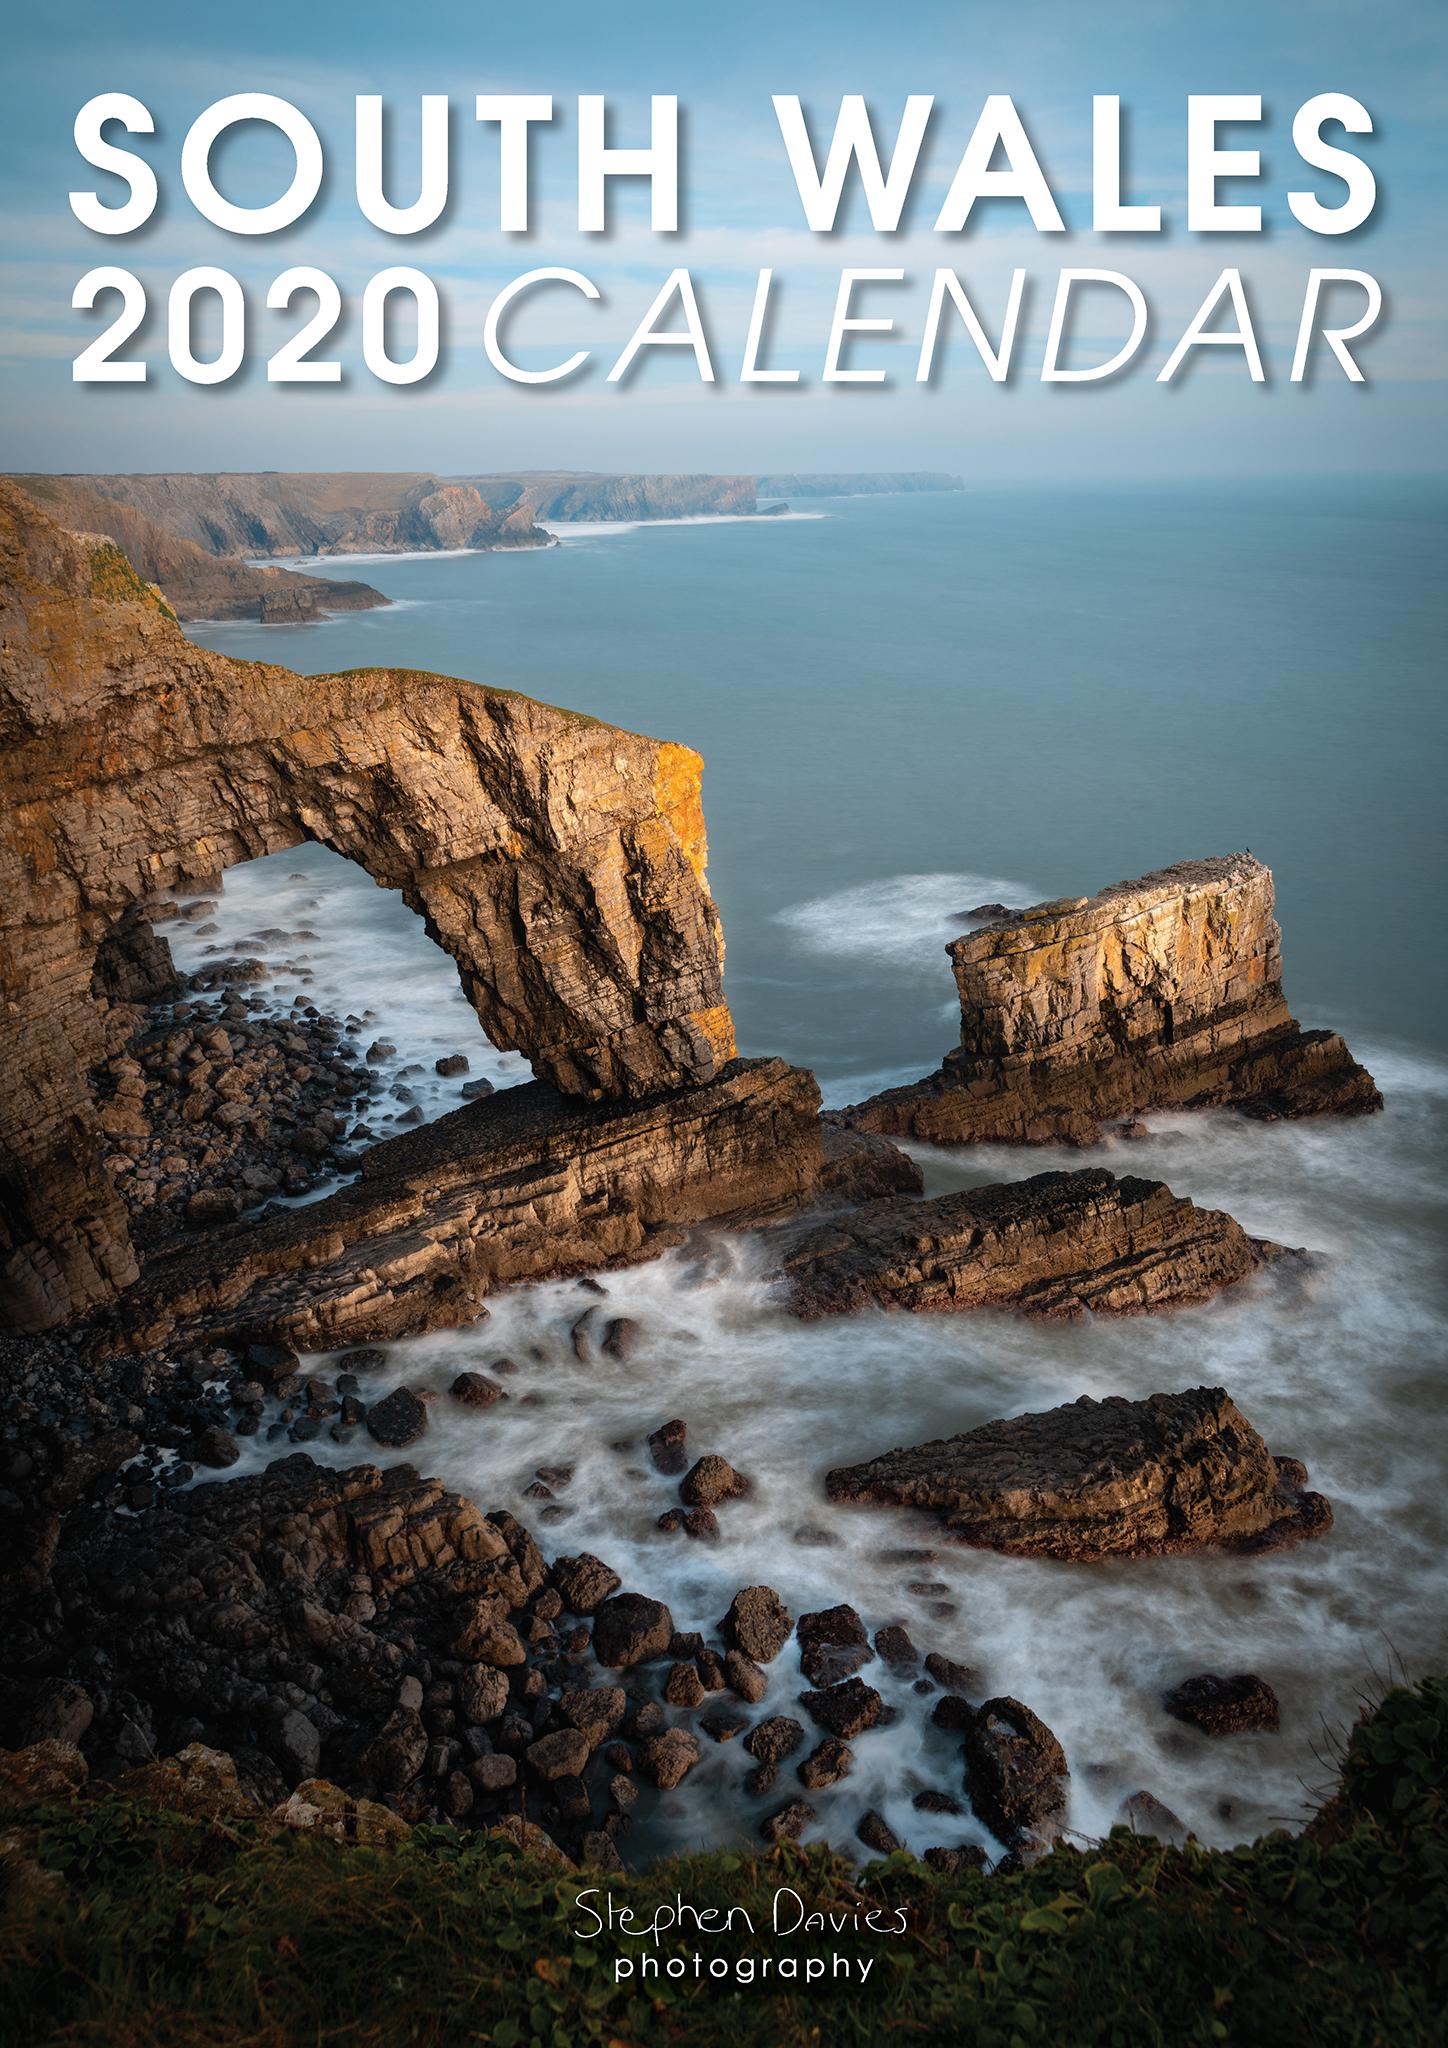 South Wales 2020 Calendar